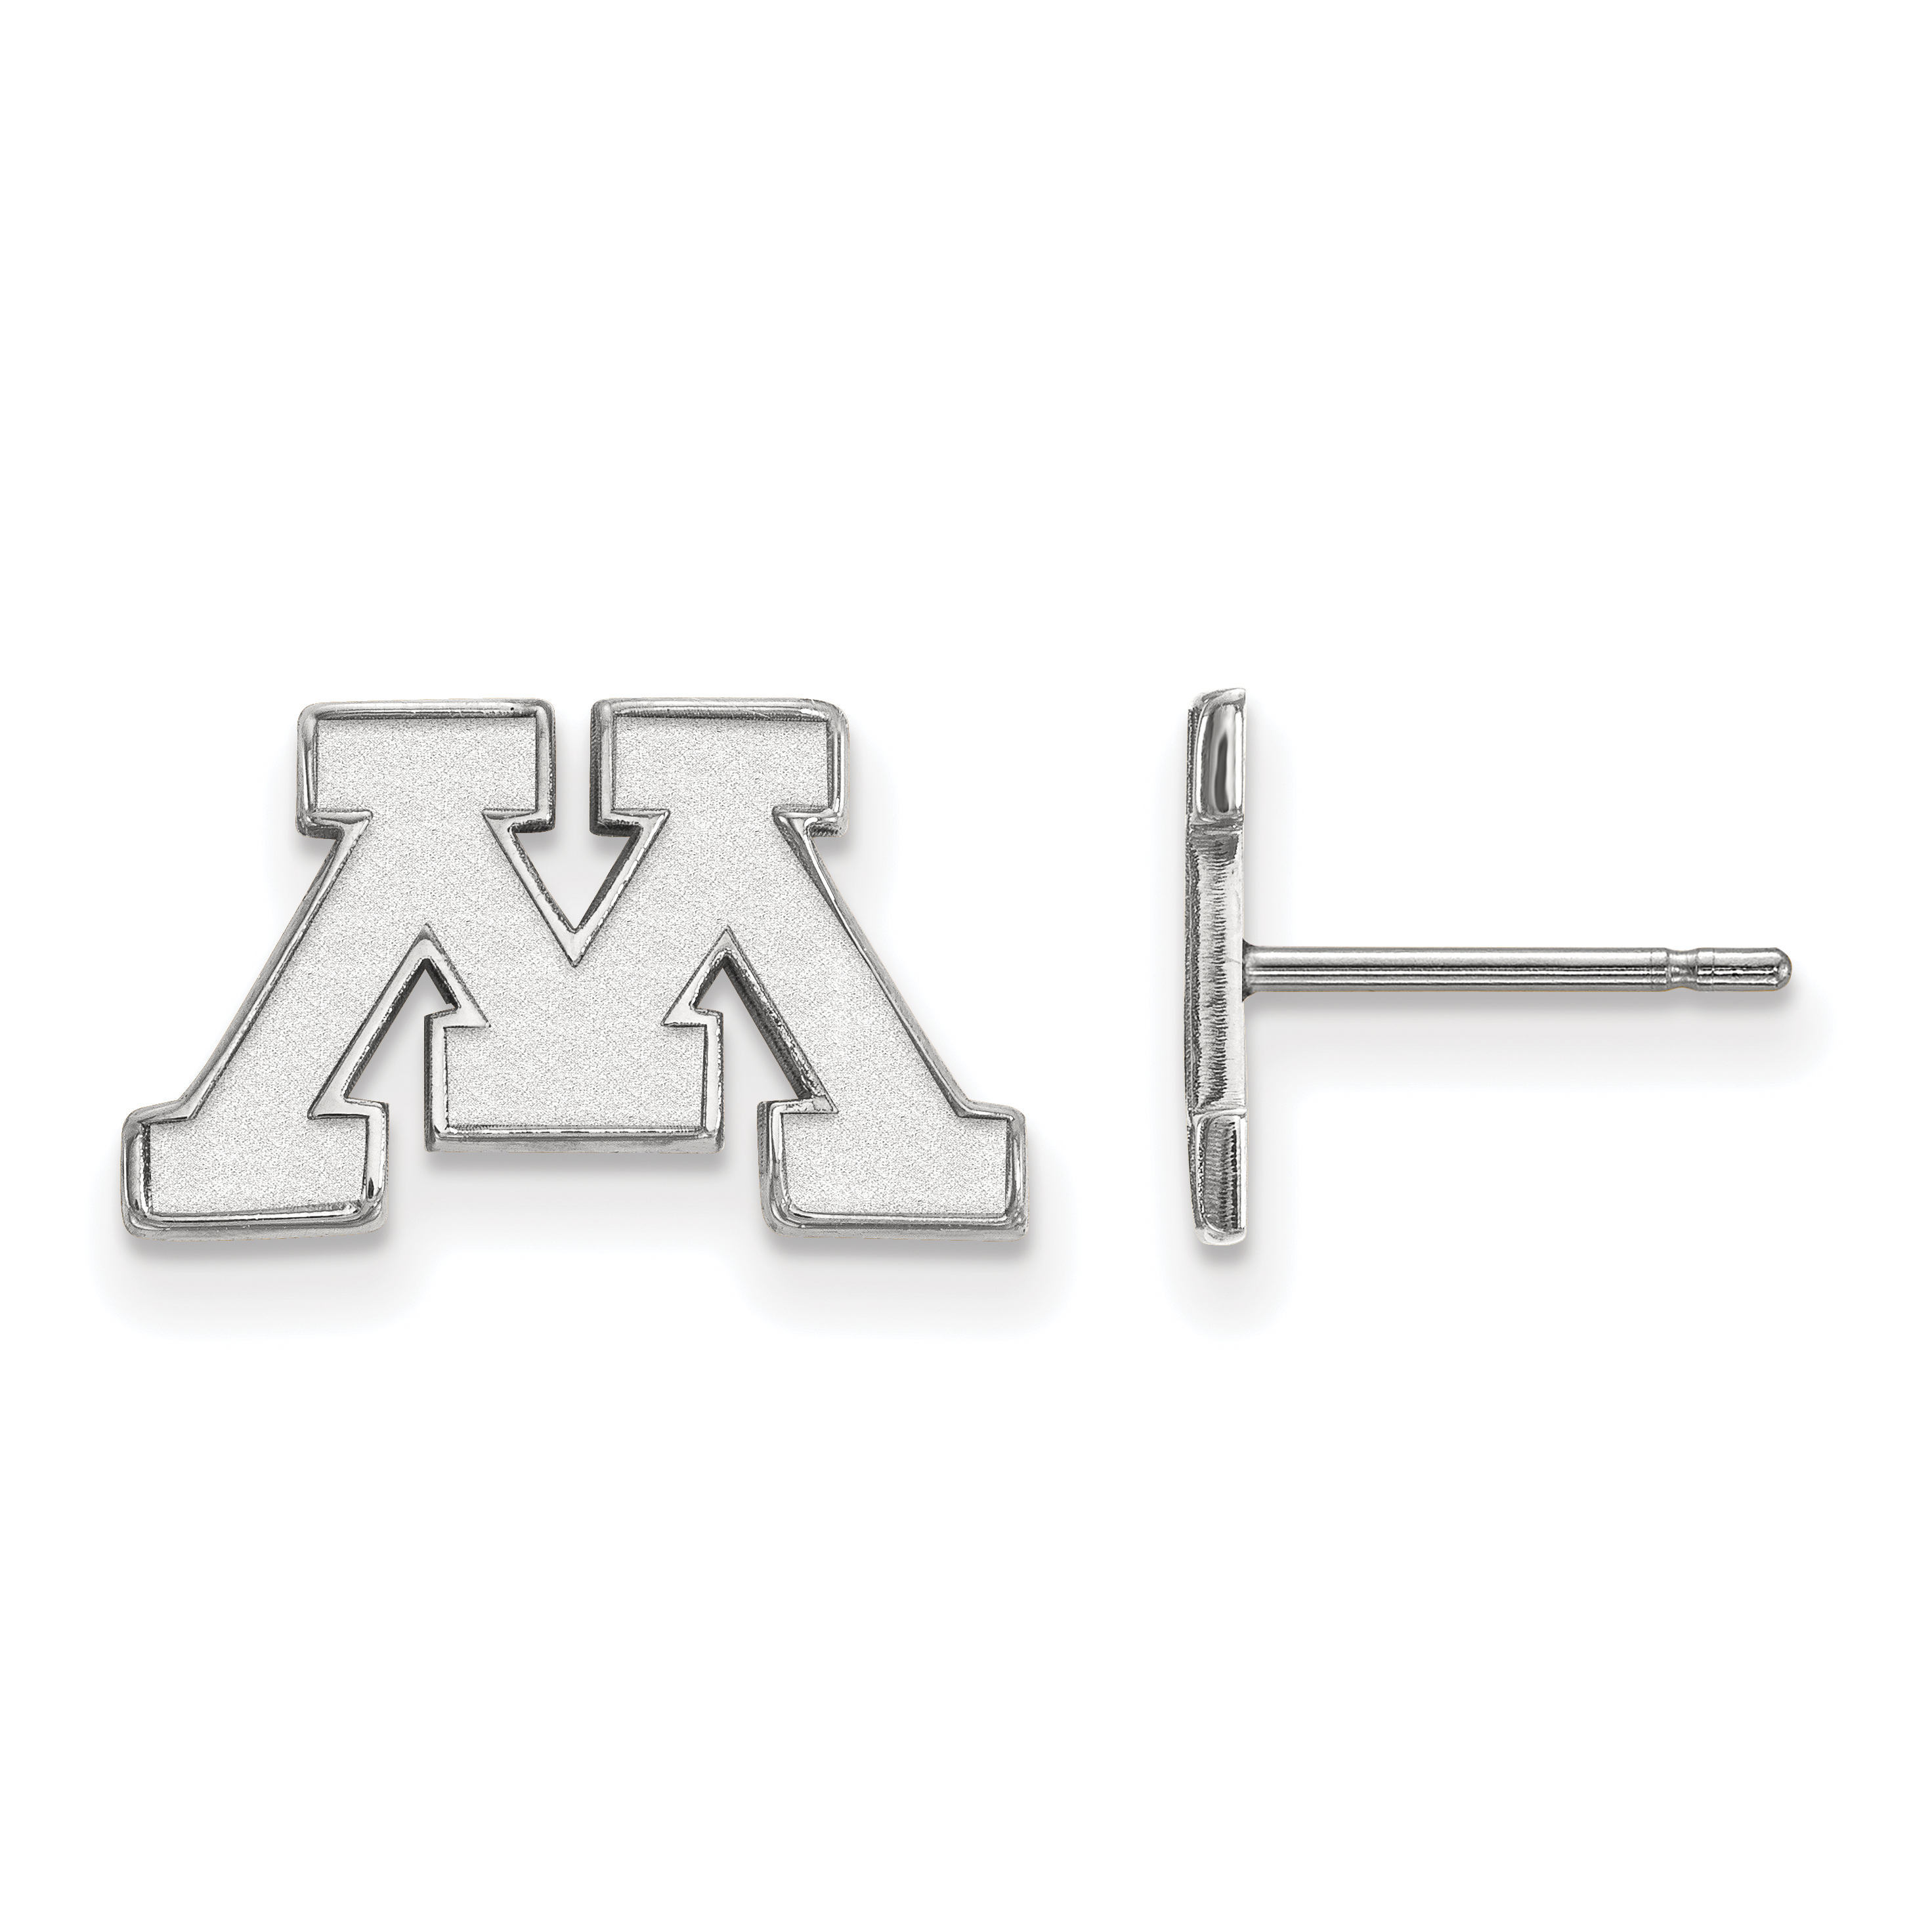 10kw University of Minnesota XS Post Earrings. weight: 1.34, Lengh: 9mm